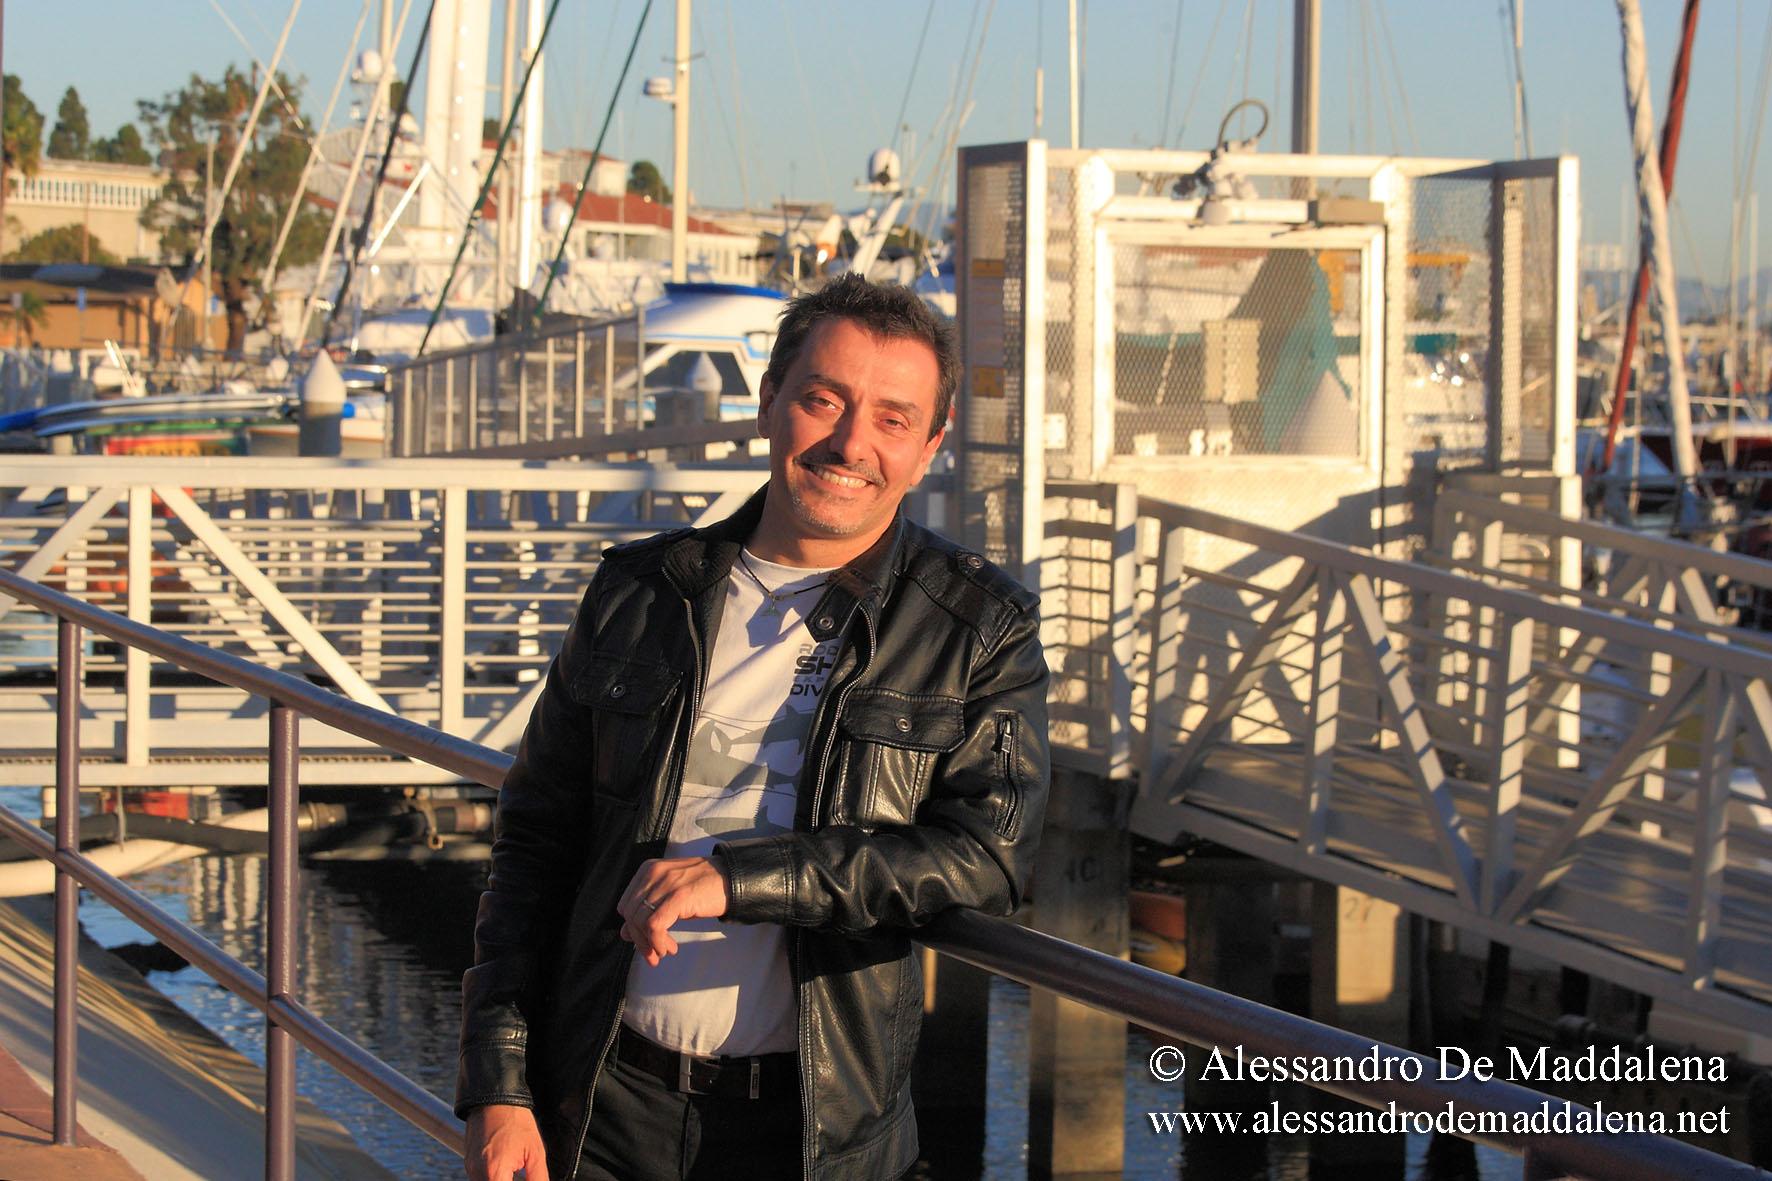 shark specialist Alessandro De Maddalena in San Diego, Californi